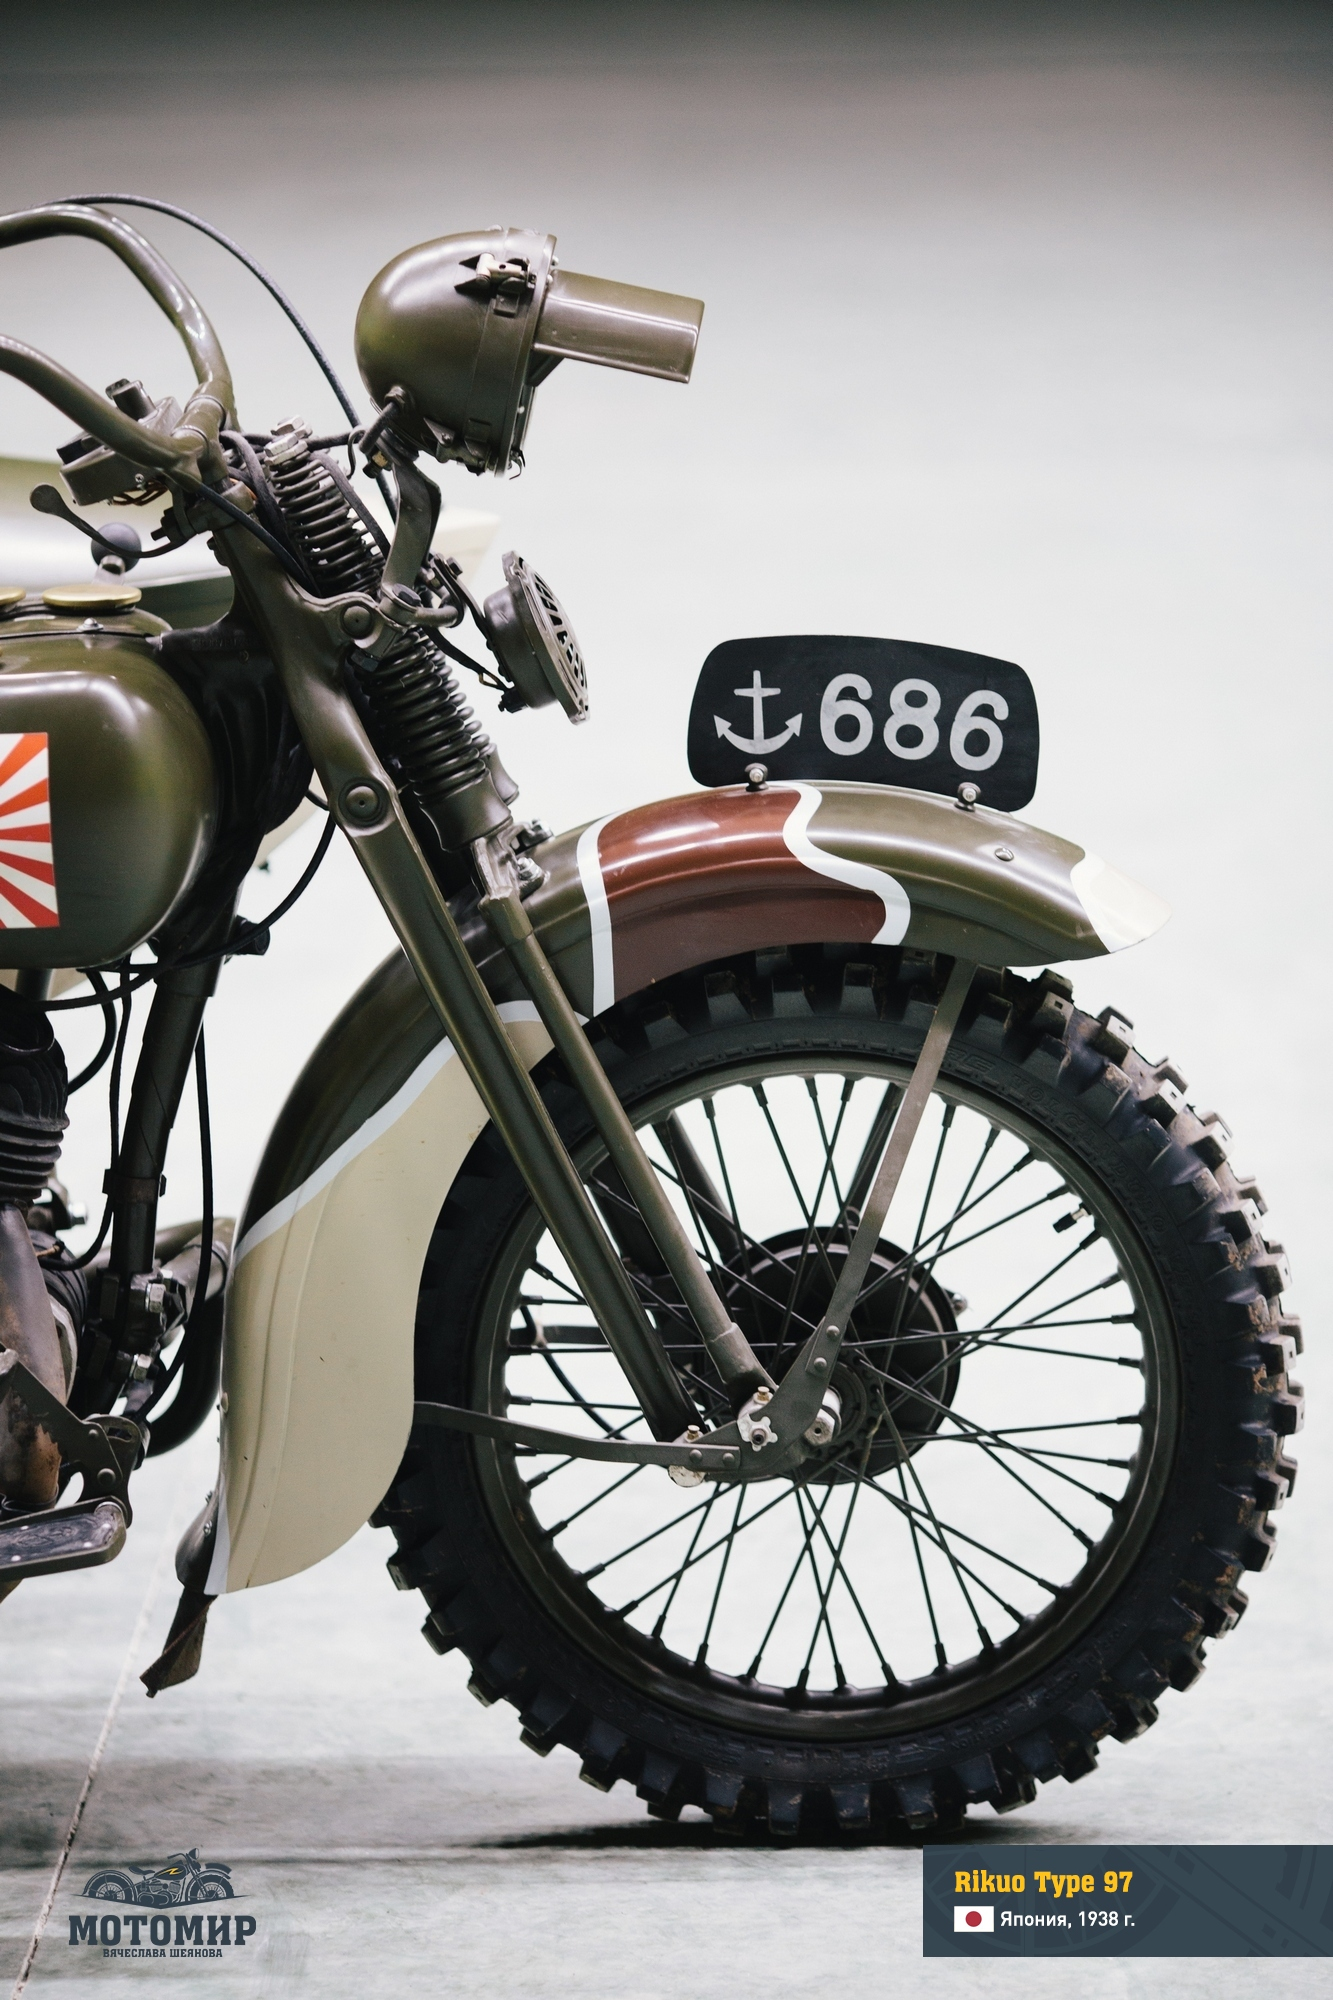 rikuo-type-97-1938-201502-web-09